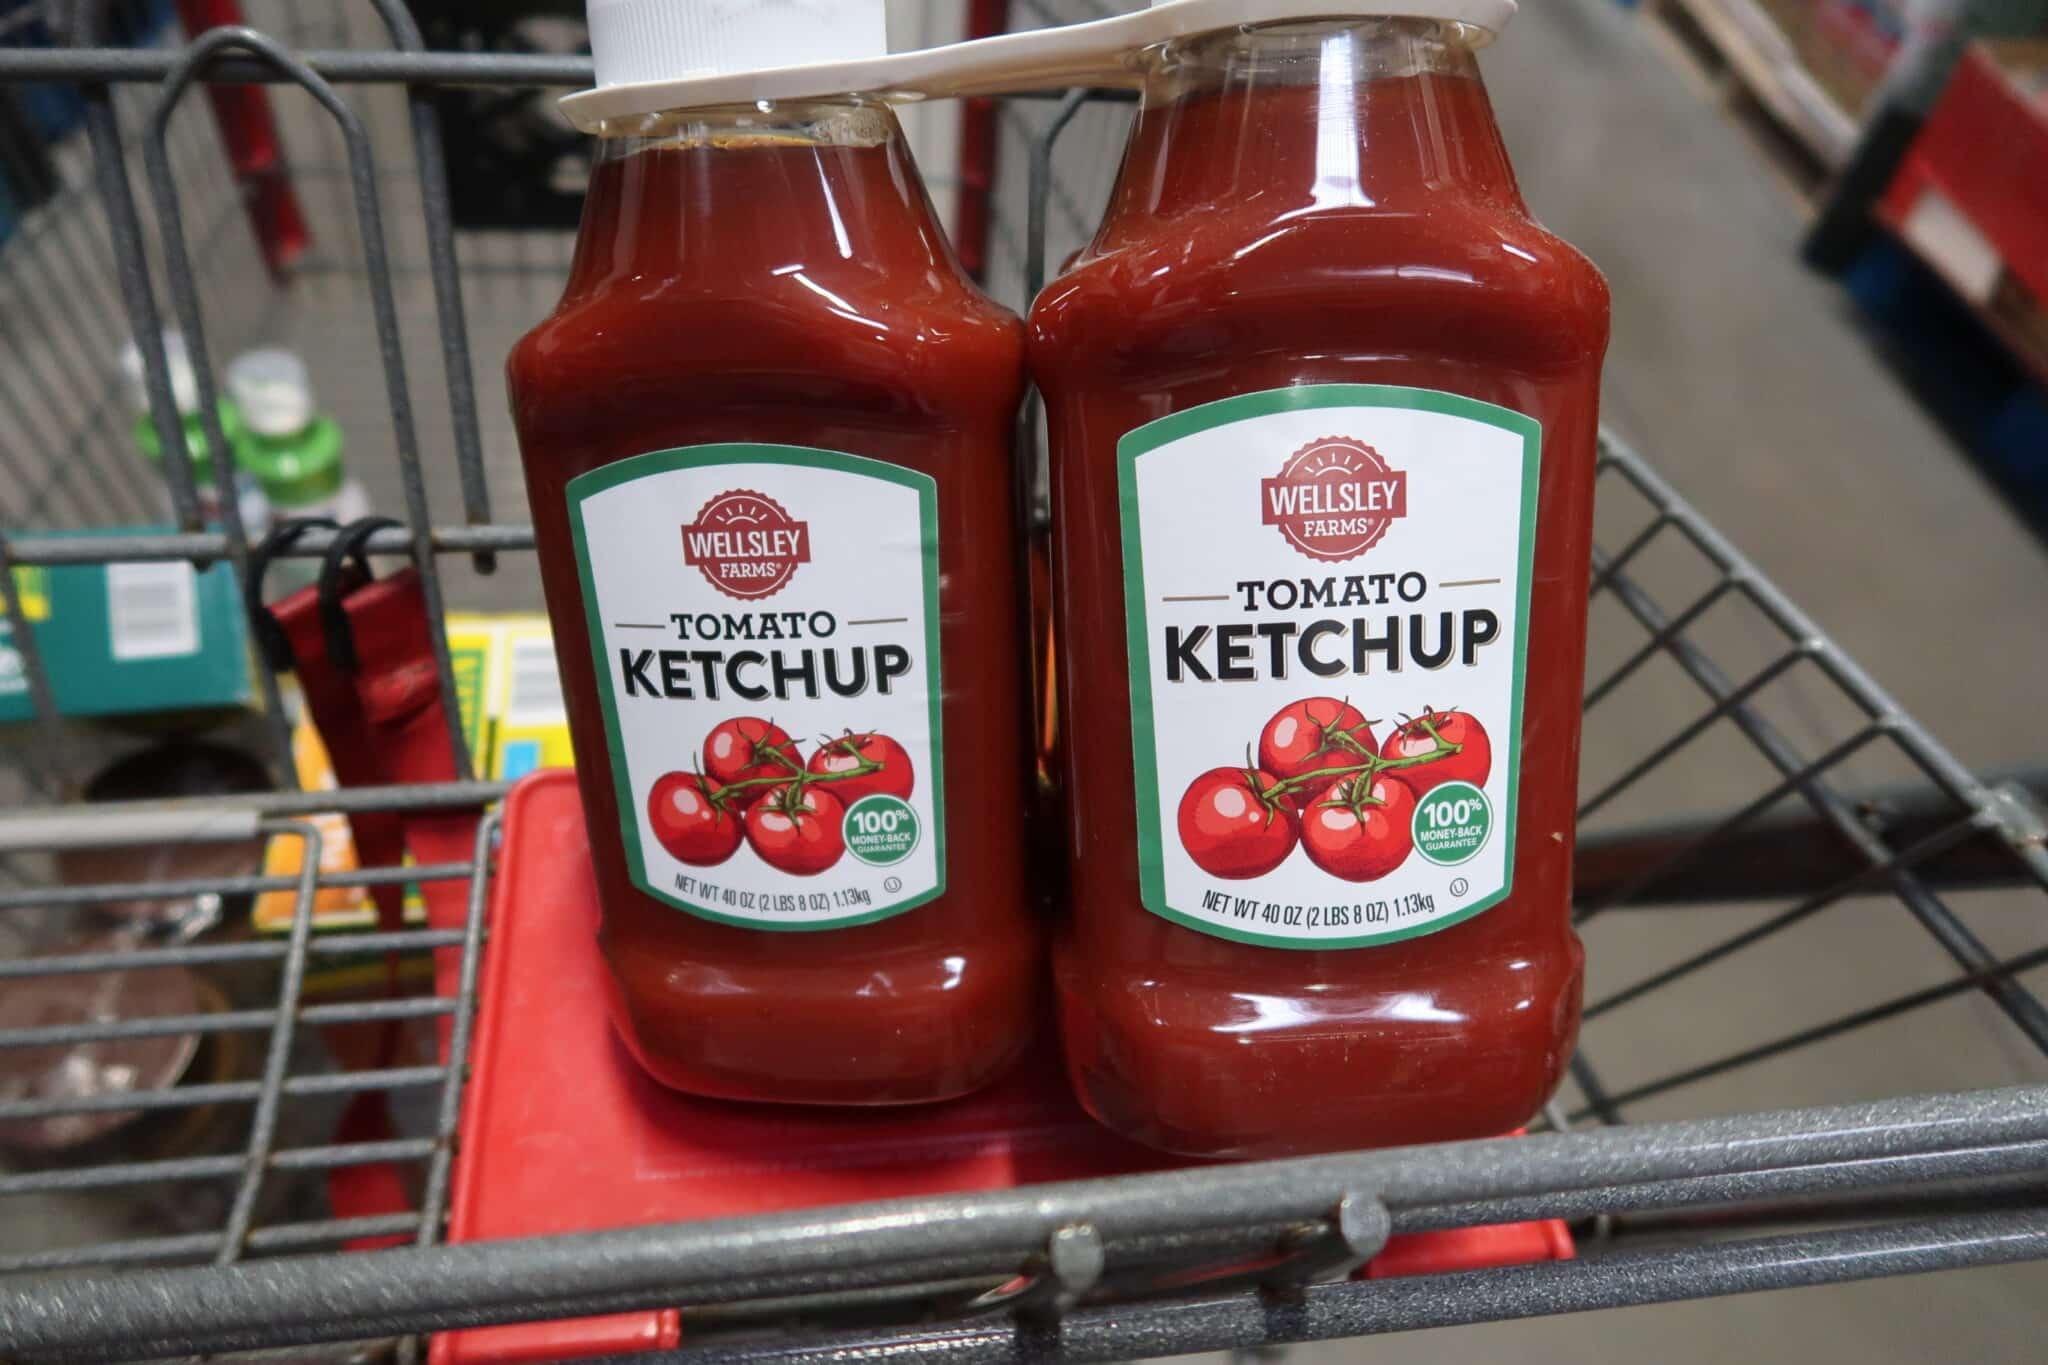 *NEW* Wellsley Farms Ketchup 3pk $5.99